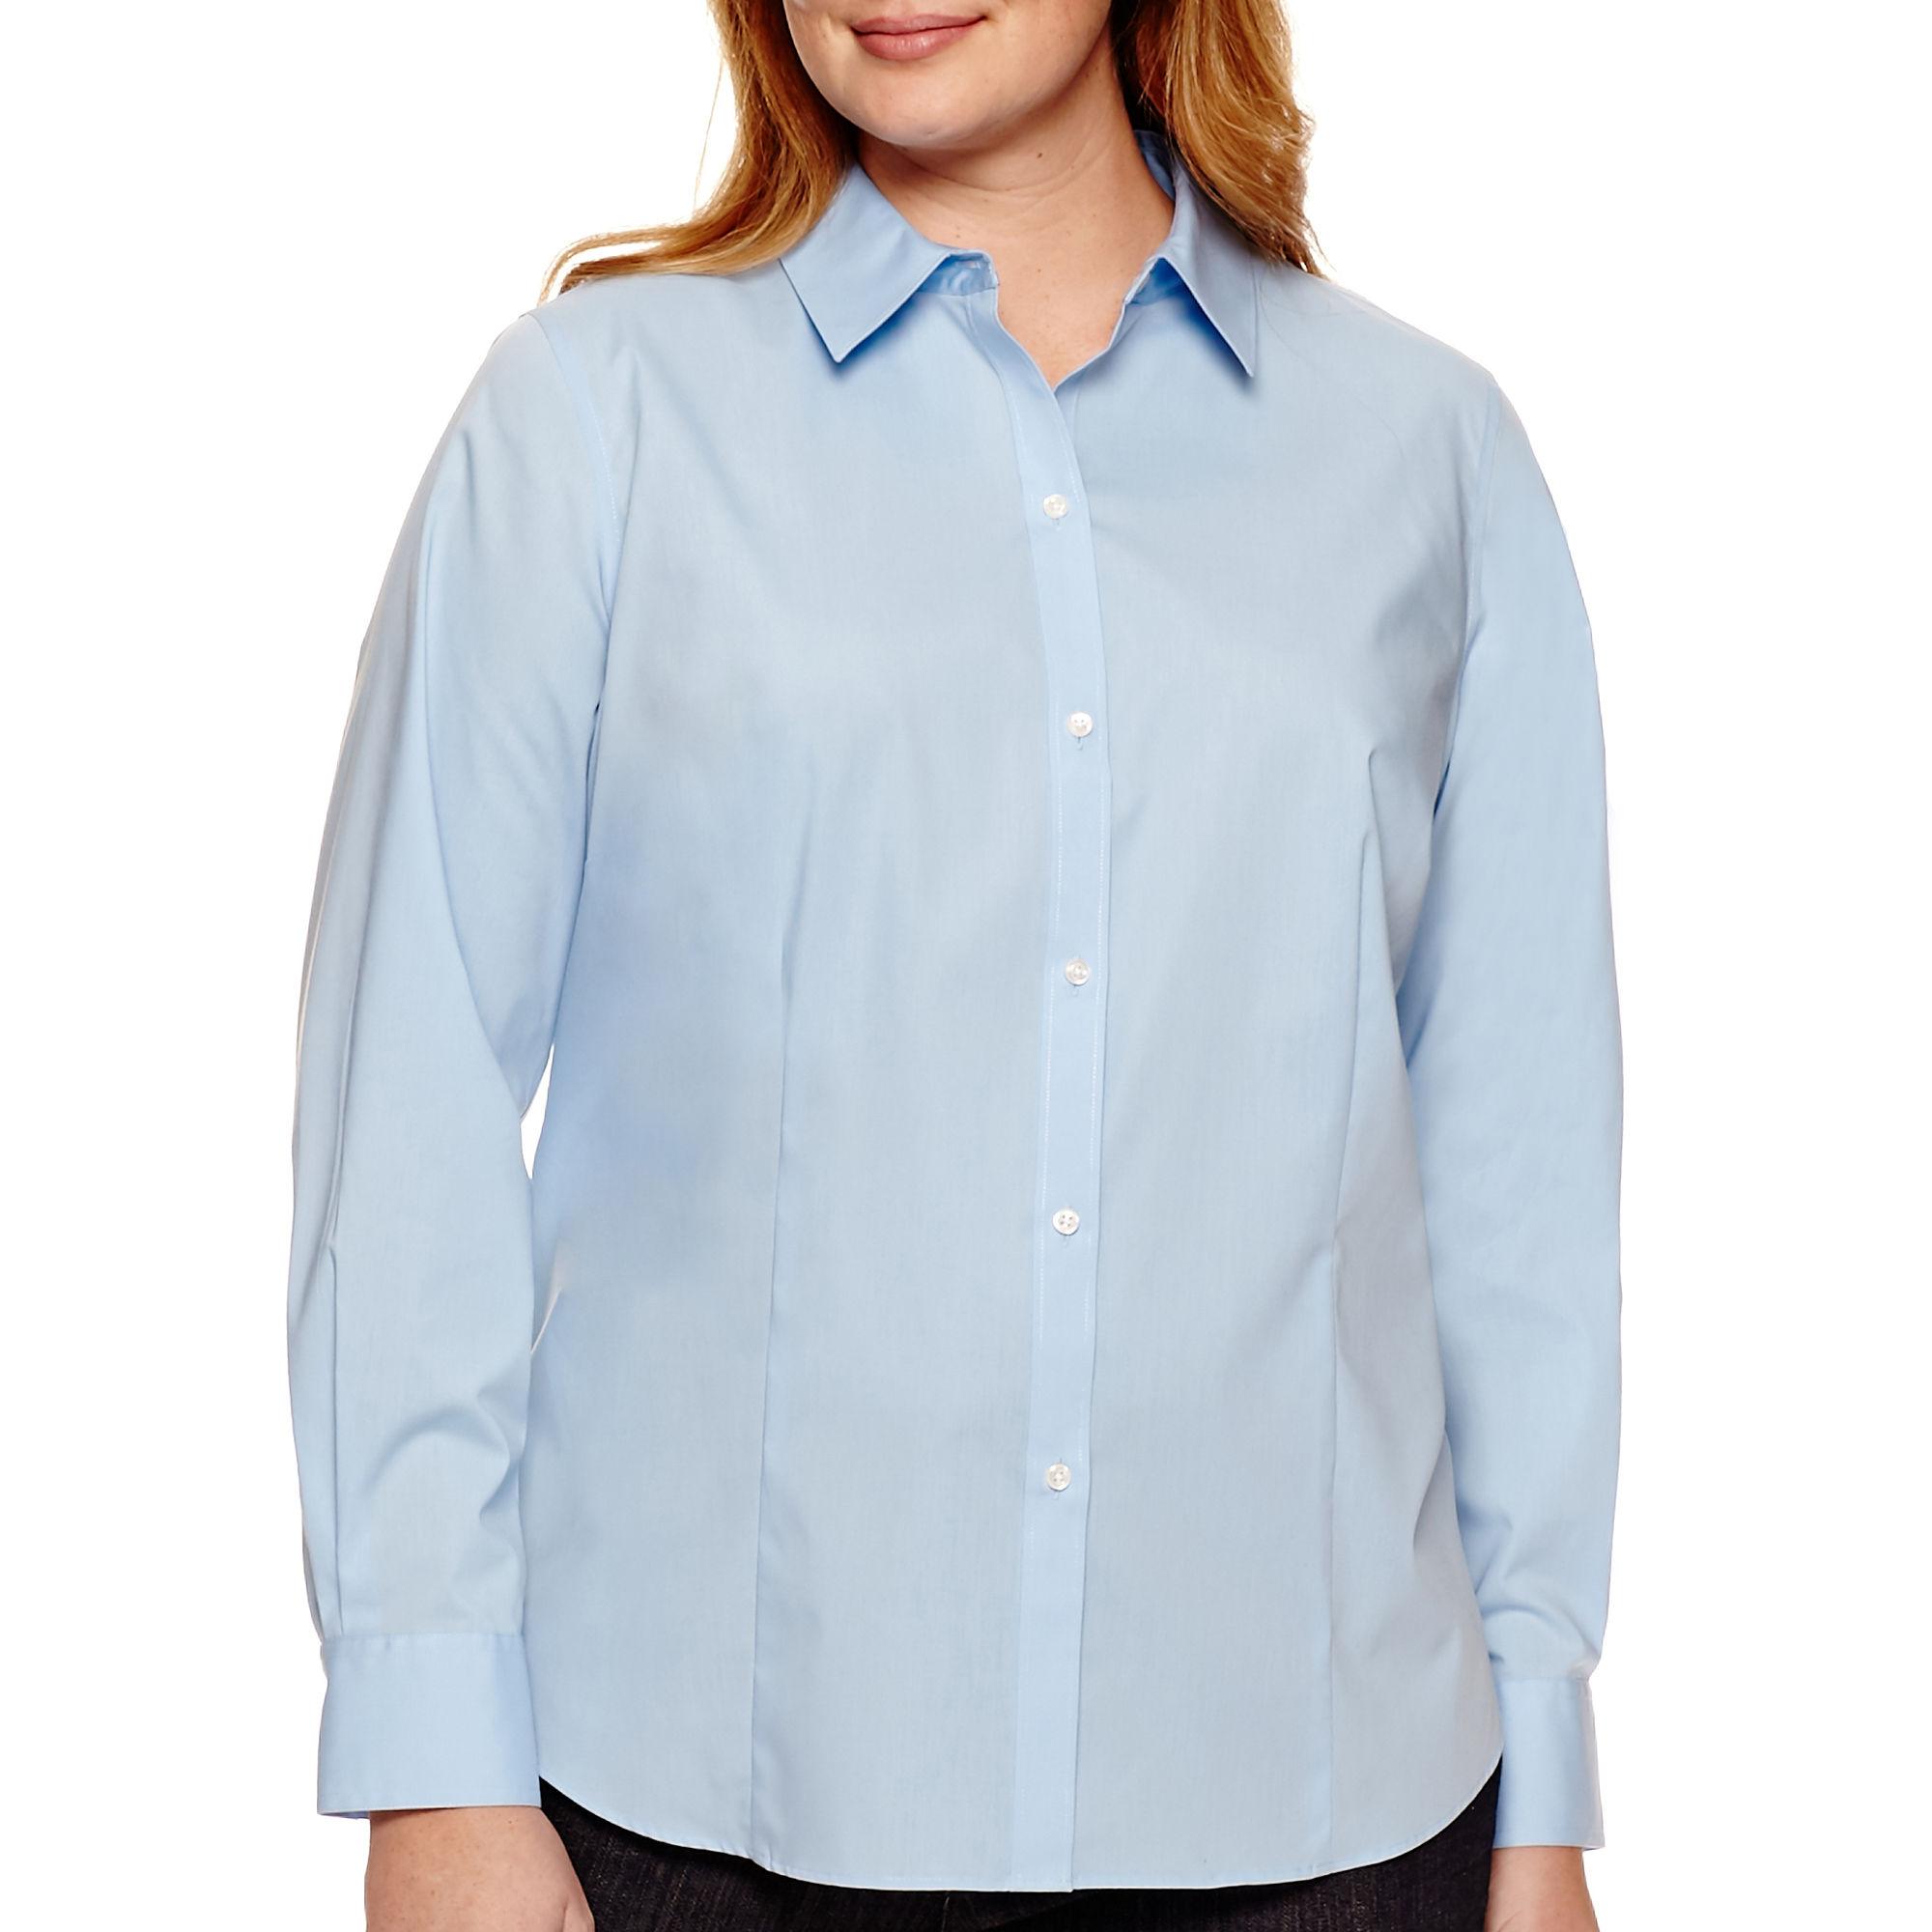 Liz Claiborne Long-Sleeve Wrinkle-Free Shirt - Plus